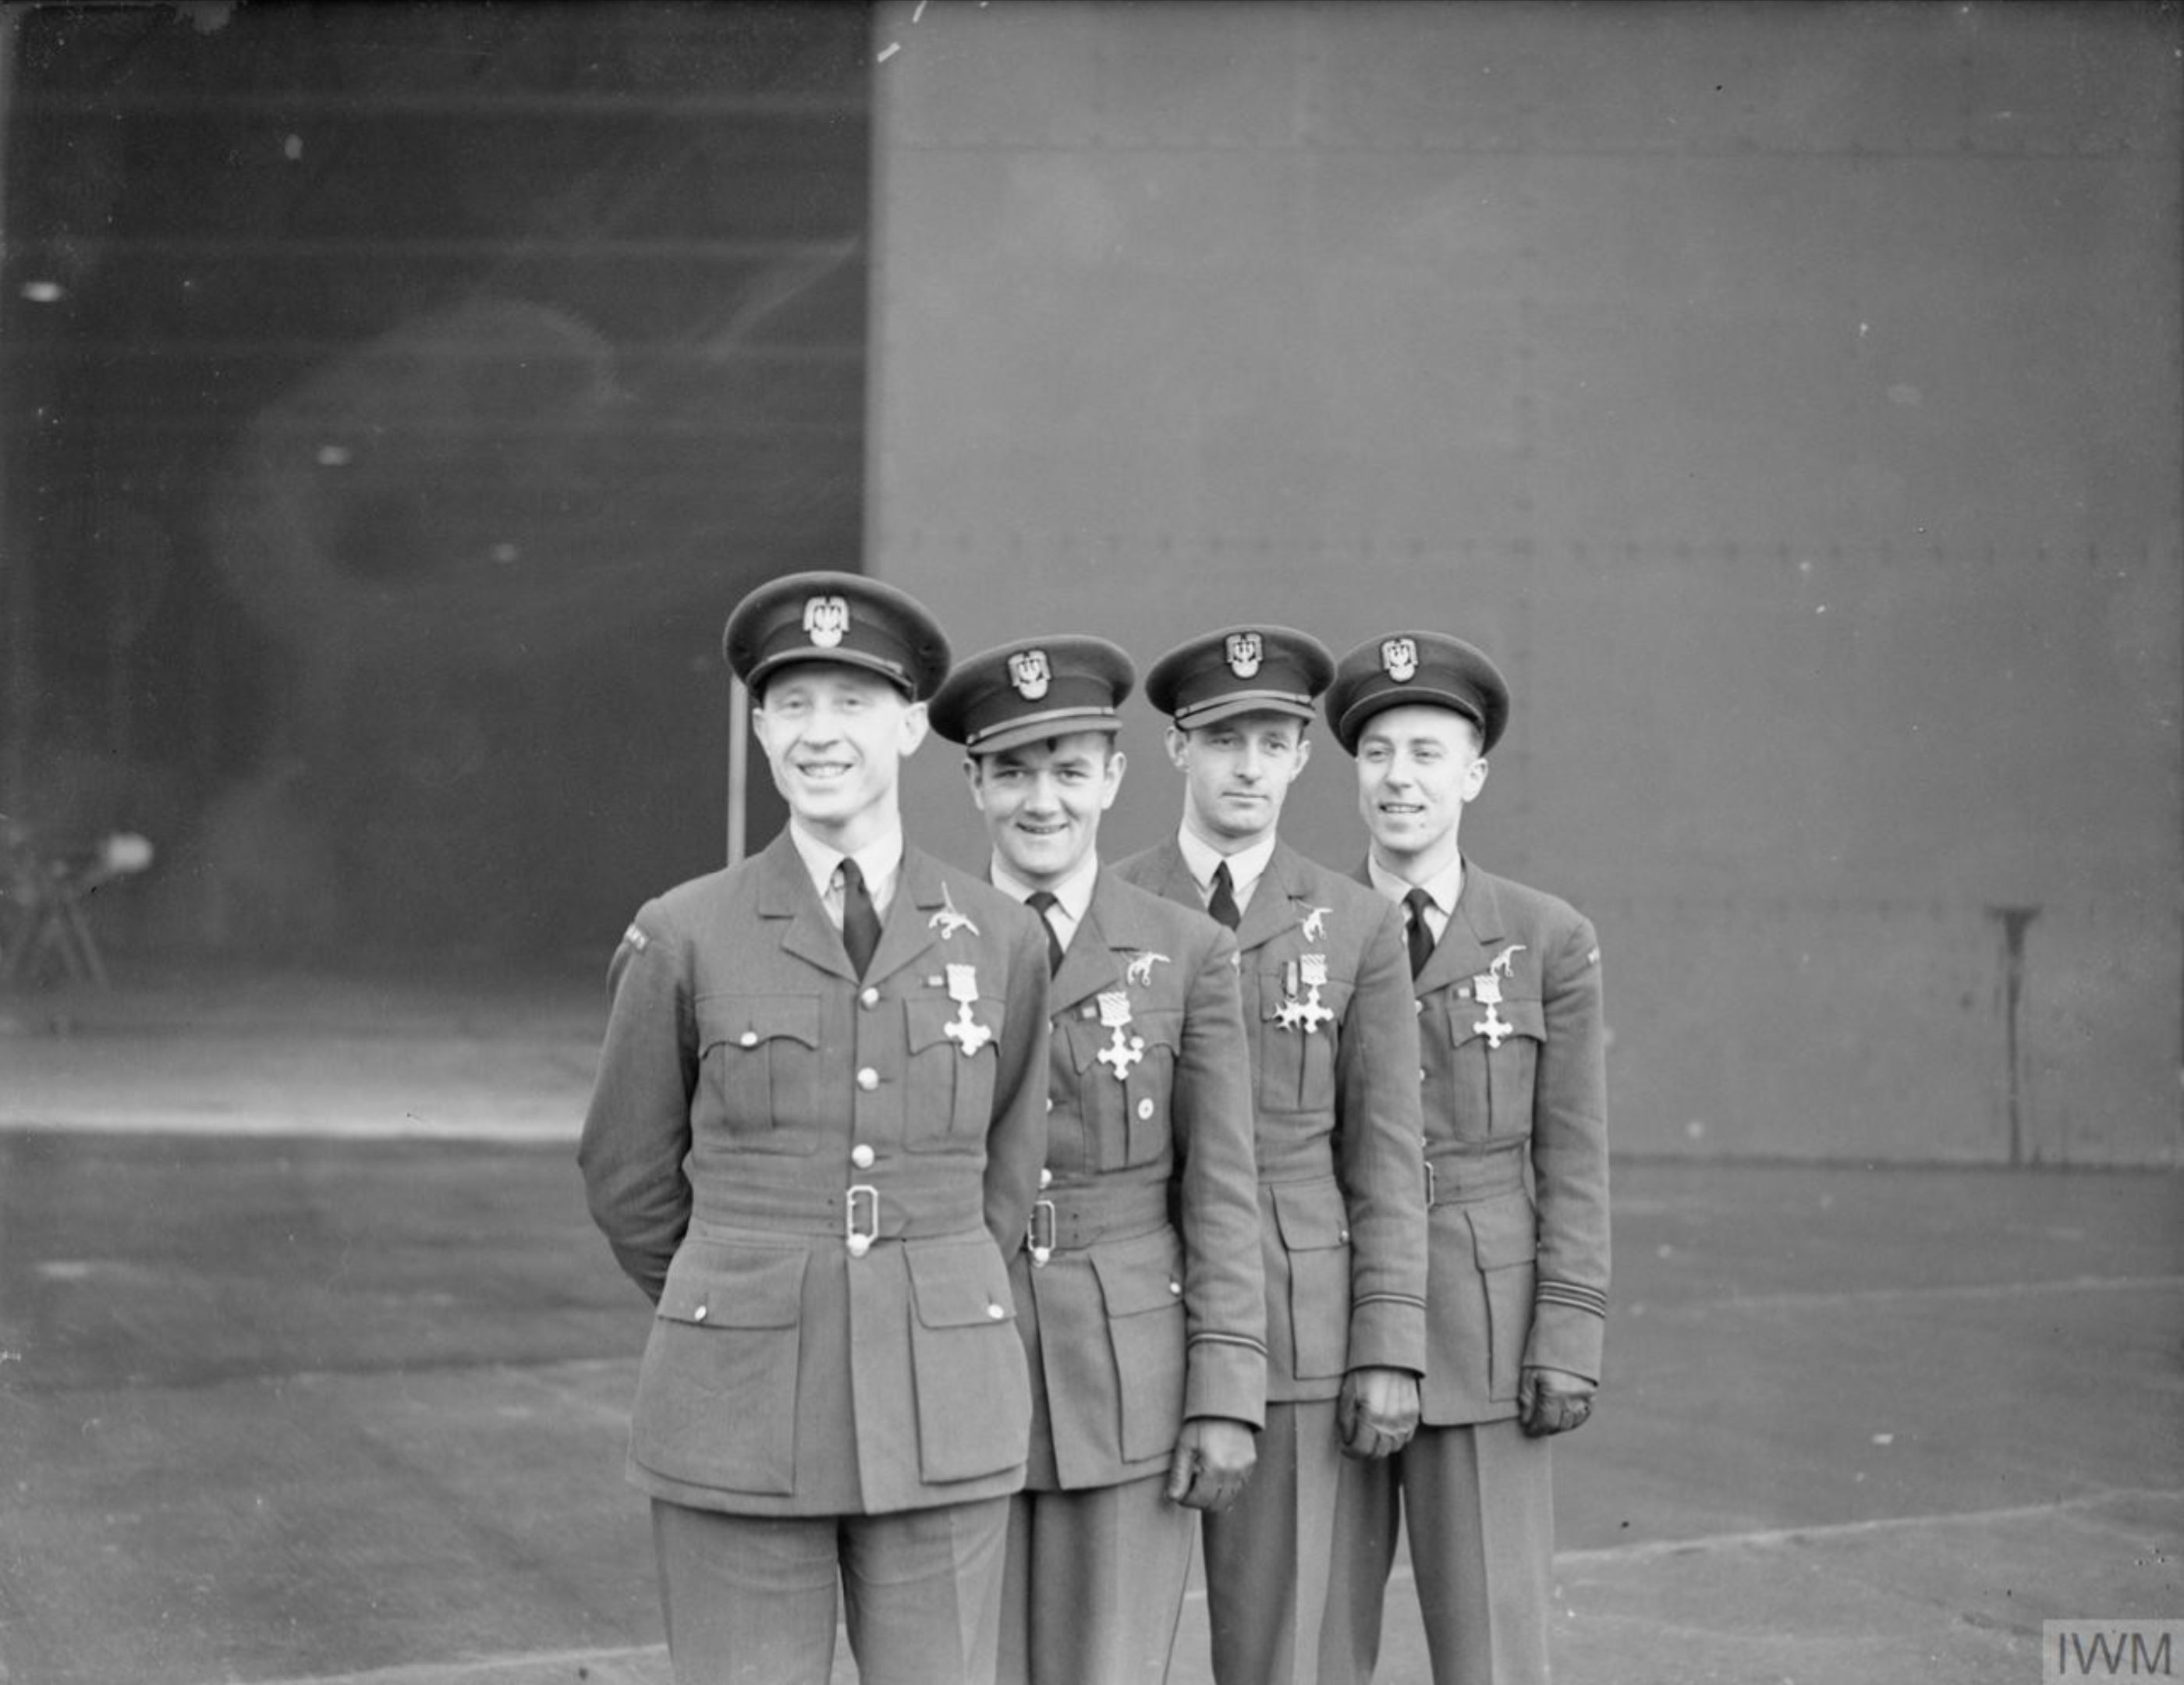 Aircrew RAF 303Sqn (Polish) pilots at awards ceremony 15 Dec 1940 IWM CH1840